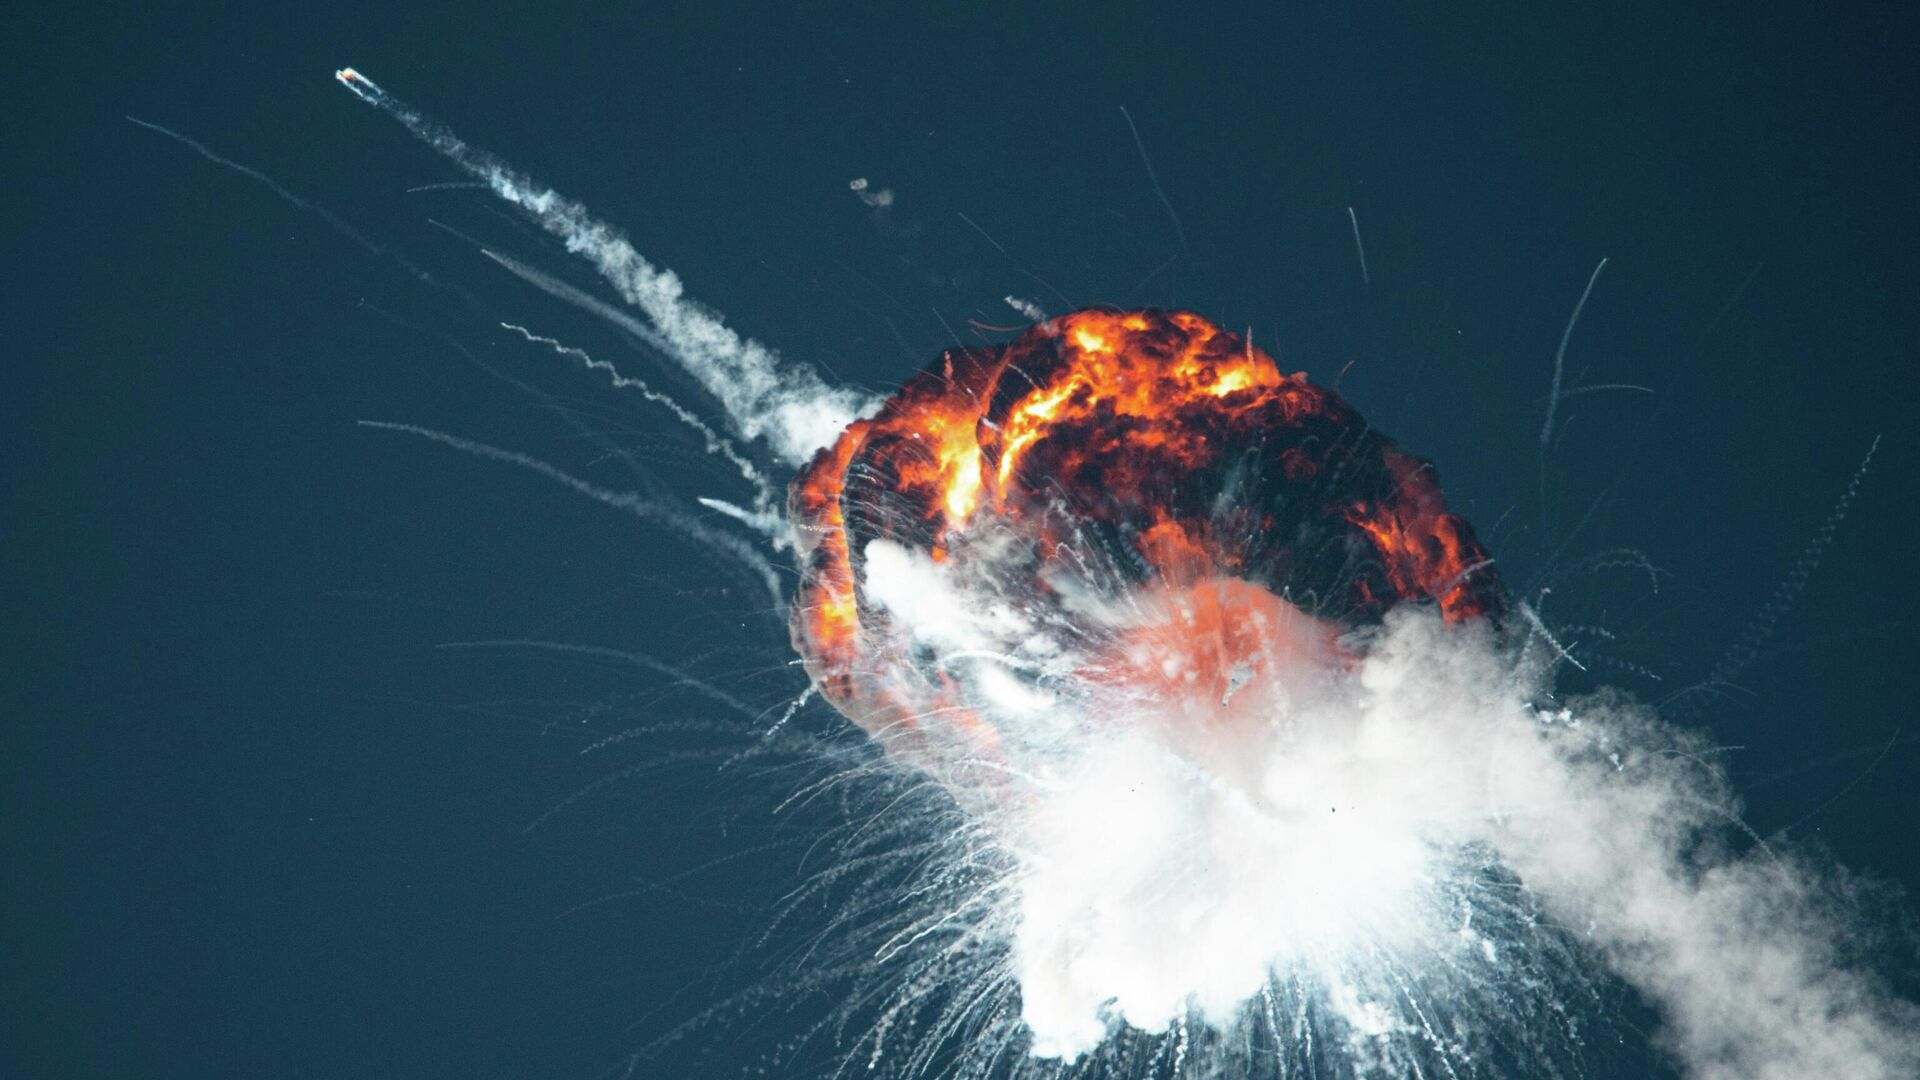 Esplosione razzo Alpha Firefly - Sputnik Italia, 1920, 03.09.2021